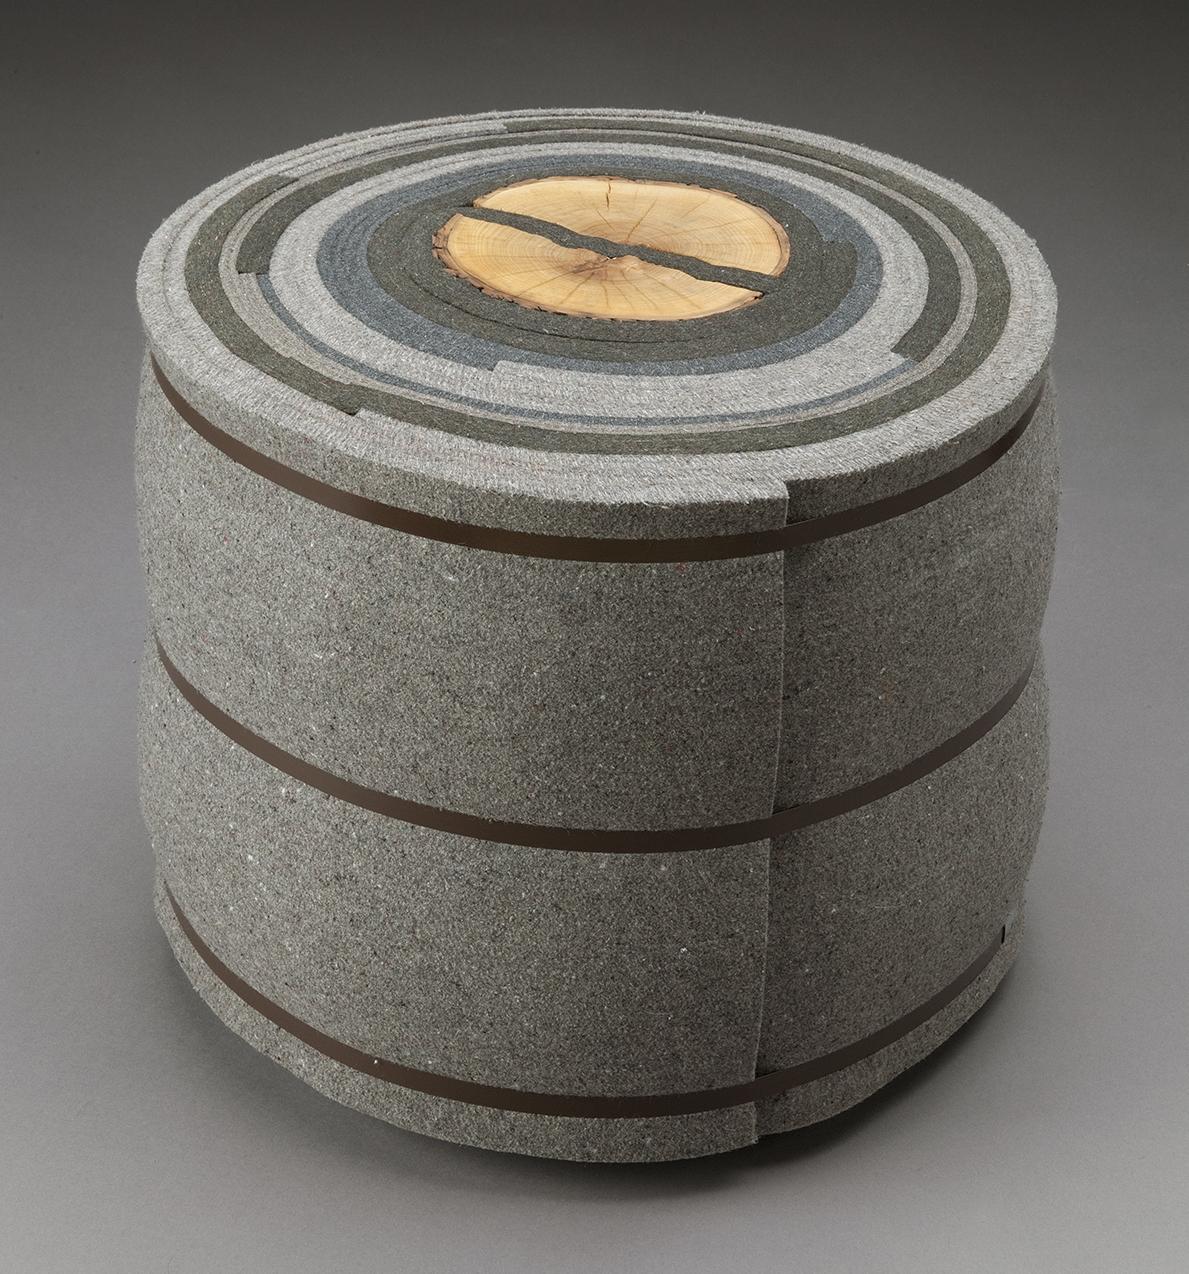 Roll Up 2 | 2007 | felt, firewood, steel | 16 x 19